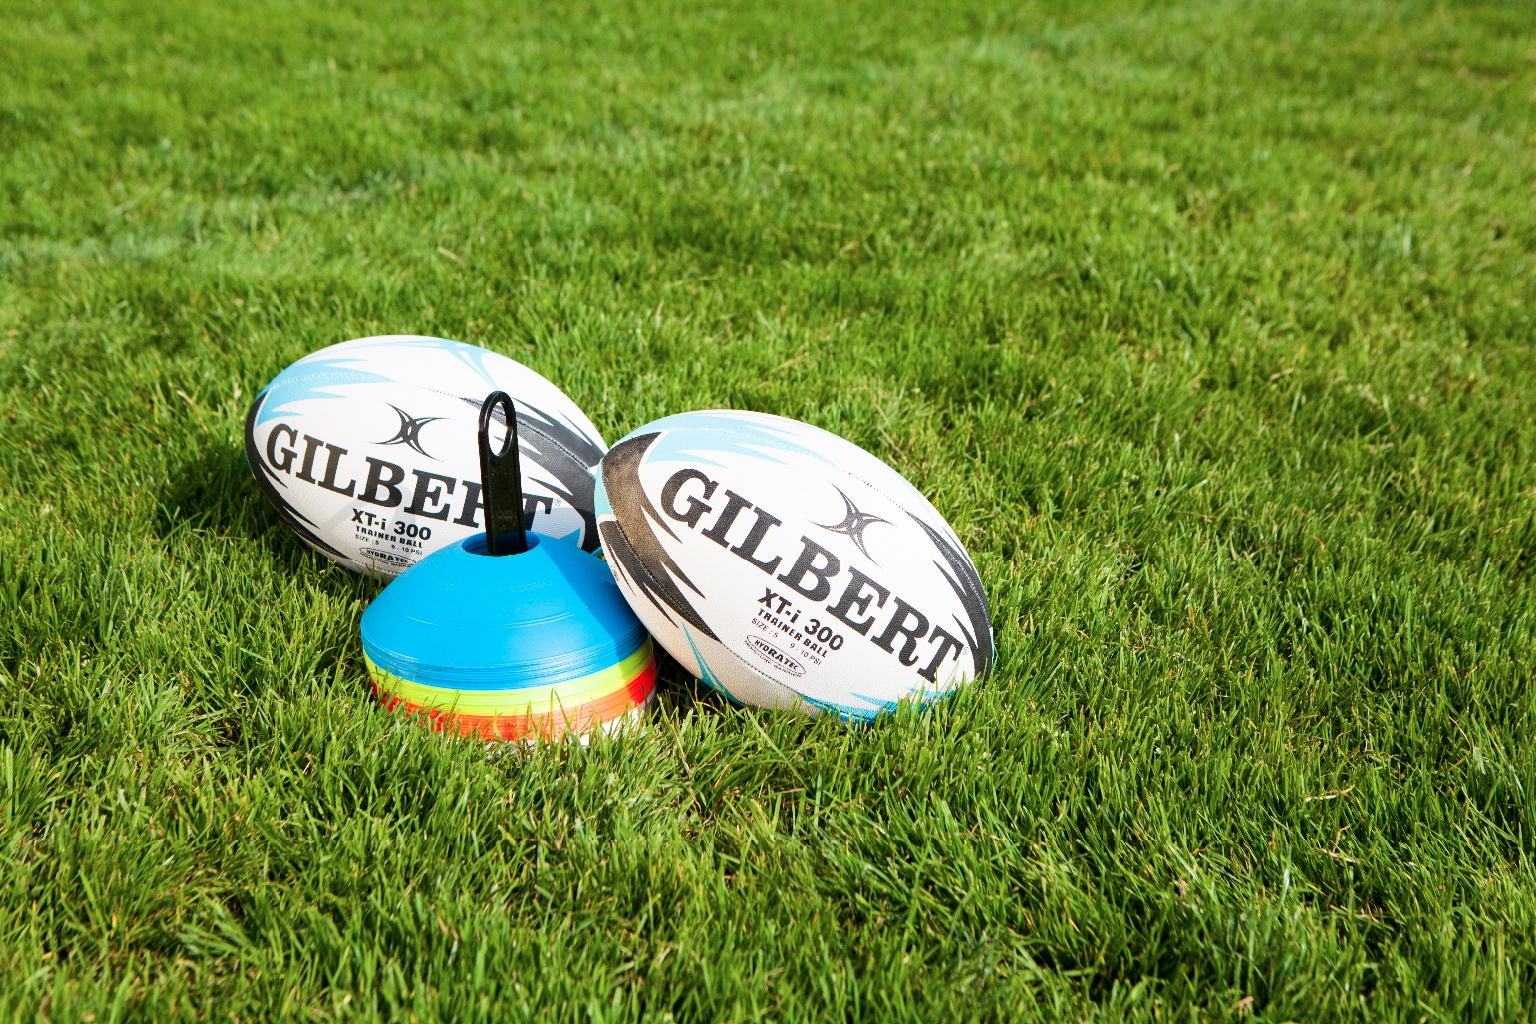 Harrogate Rufc 0 Vs 0 Ripon Rugby Union Football Club 6 January